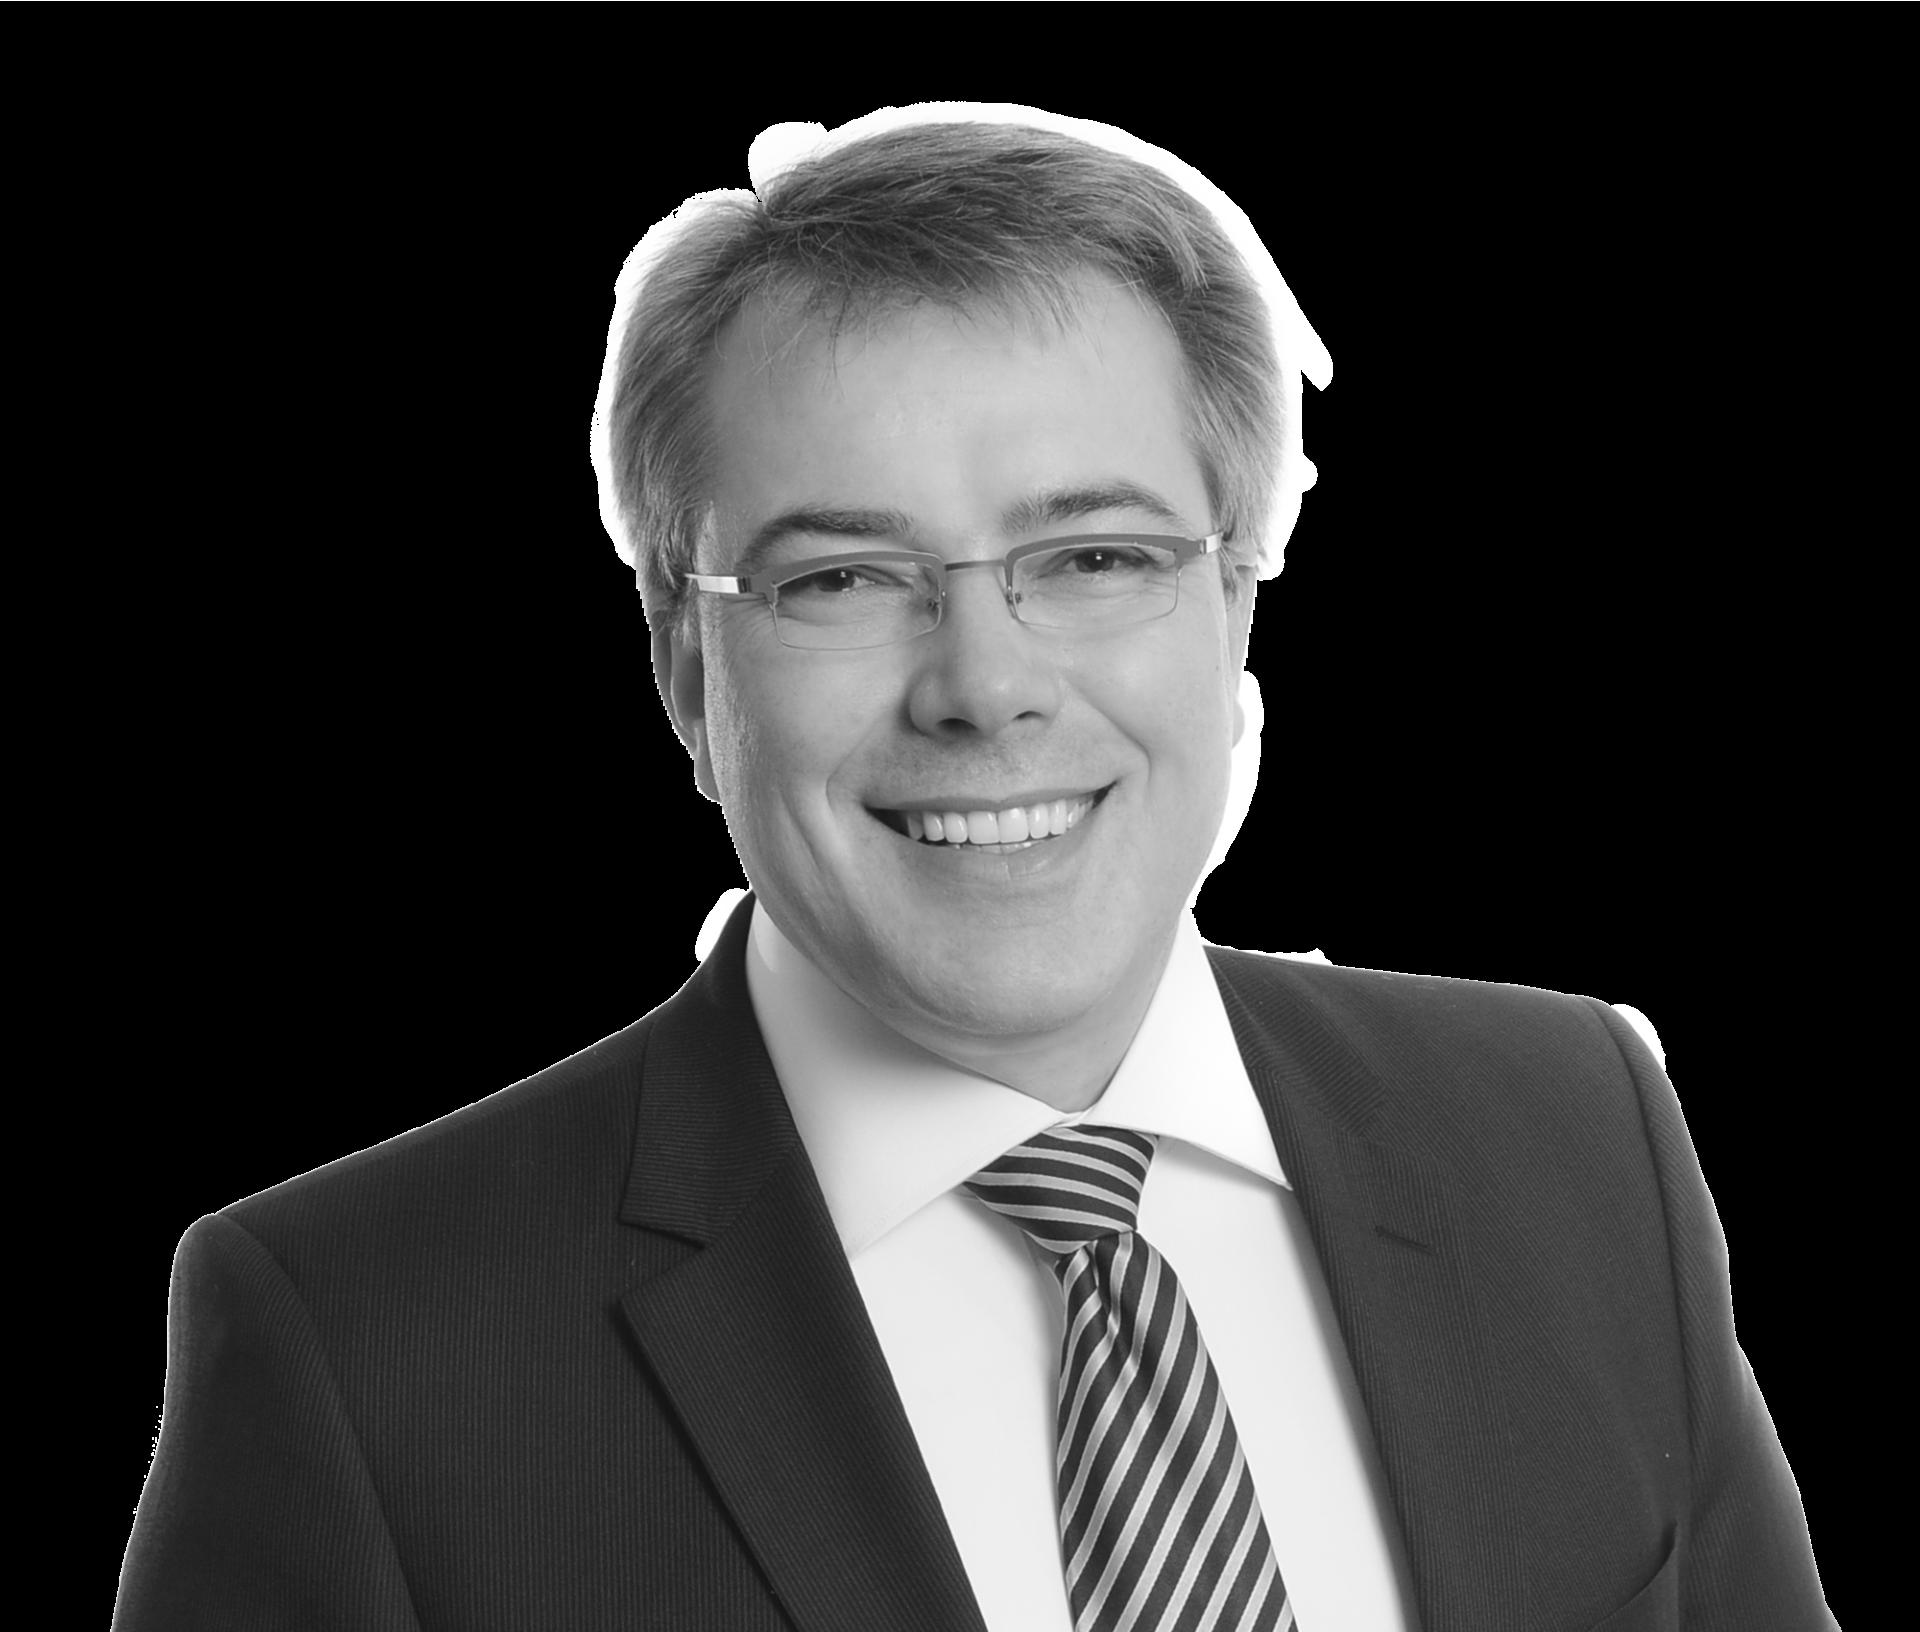 Tim Bölsche